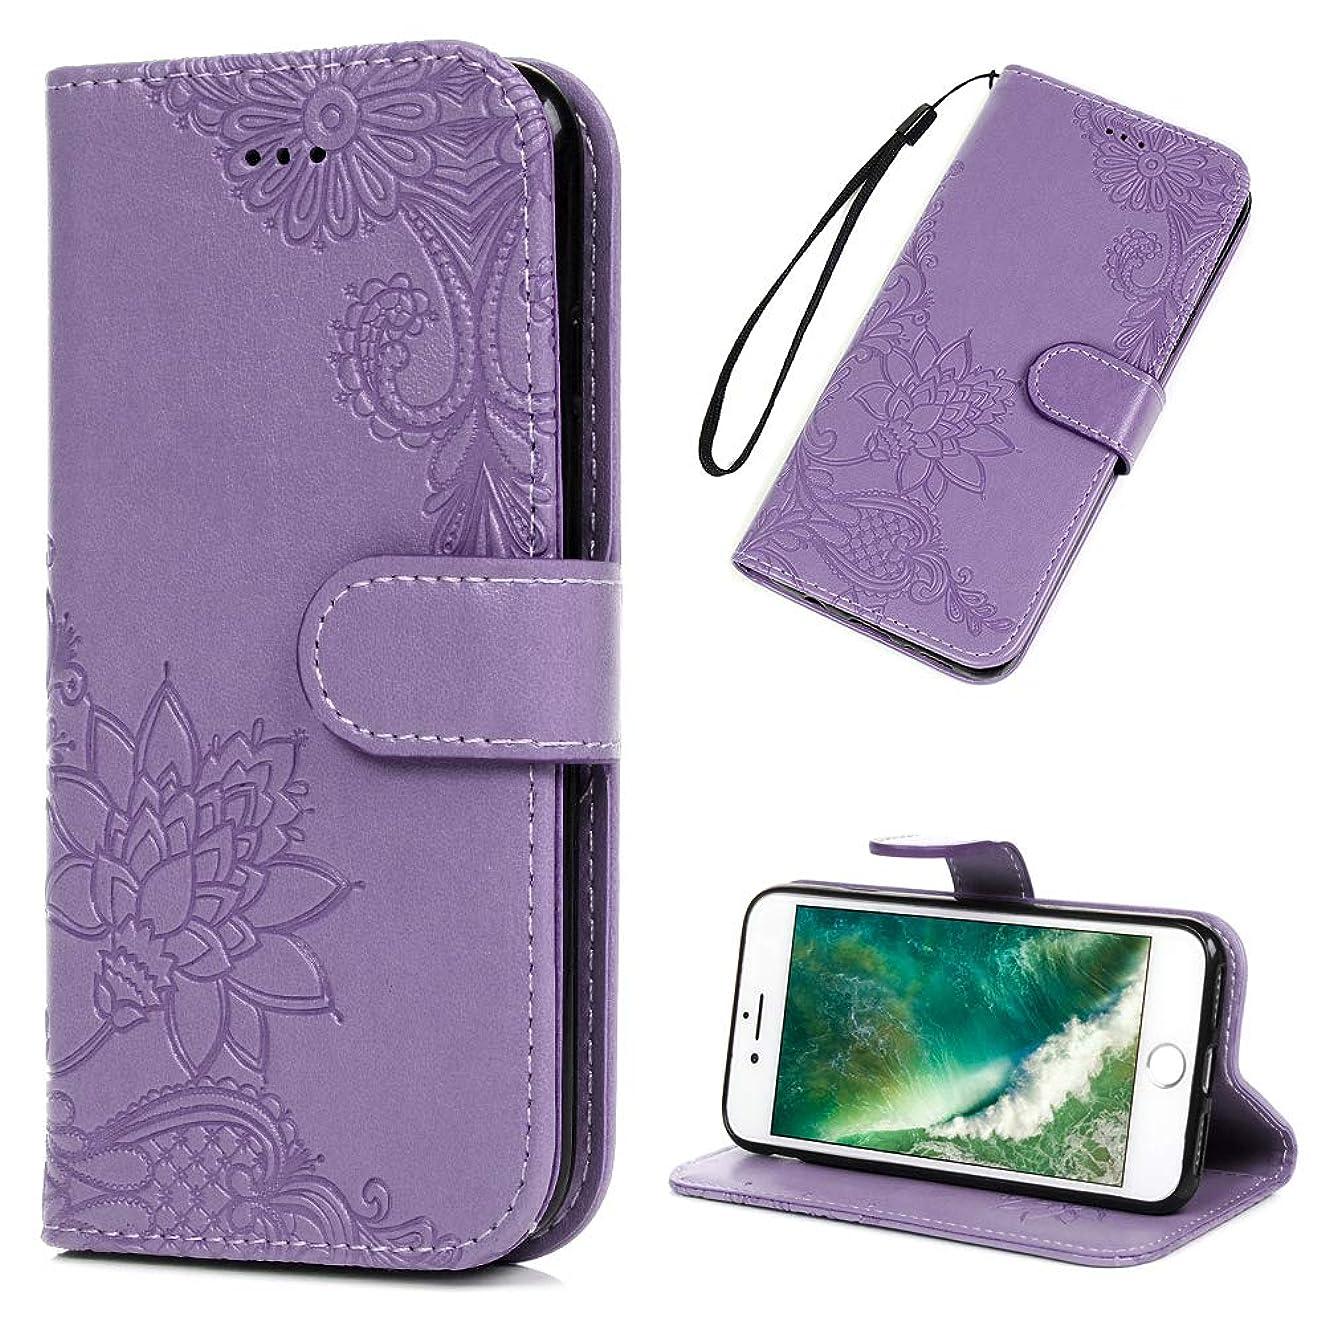 LG Q8 Case, LG V20 Mini Wallet Flip Folio Case Kickstand Card Slots Wrist String 3D Embossed Lotus Flowers Premuim PU Leather Wallet Cover Shockproof Soft TPU Rubber Bumper Slim Phone Case for LG Q8